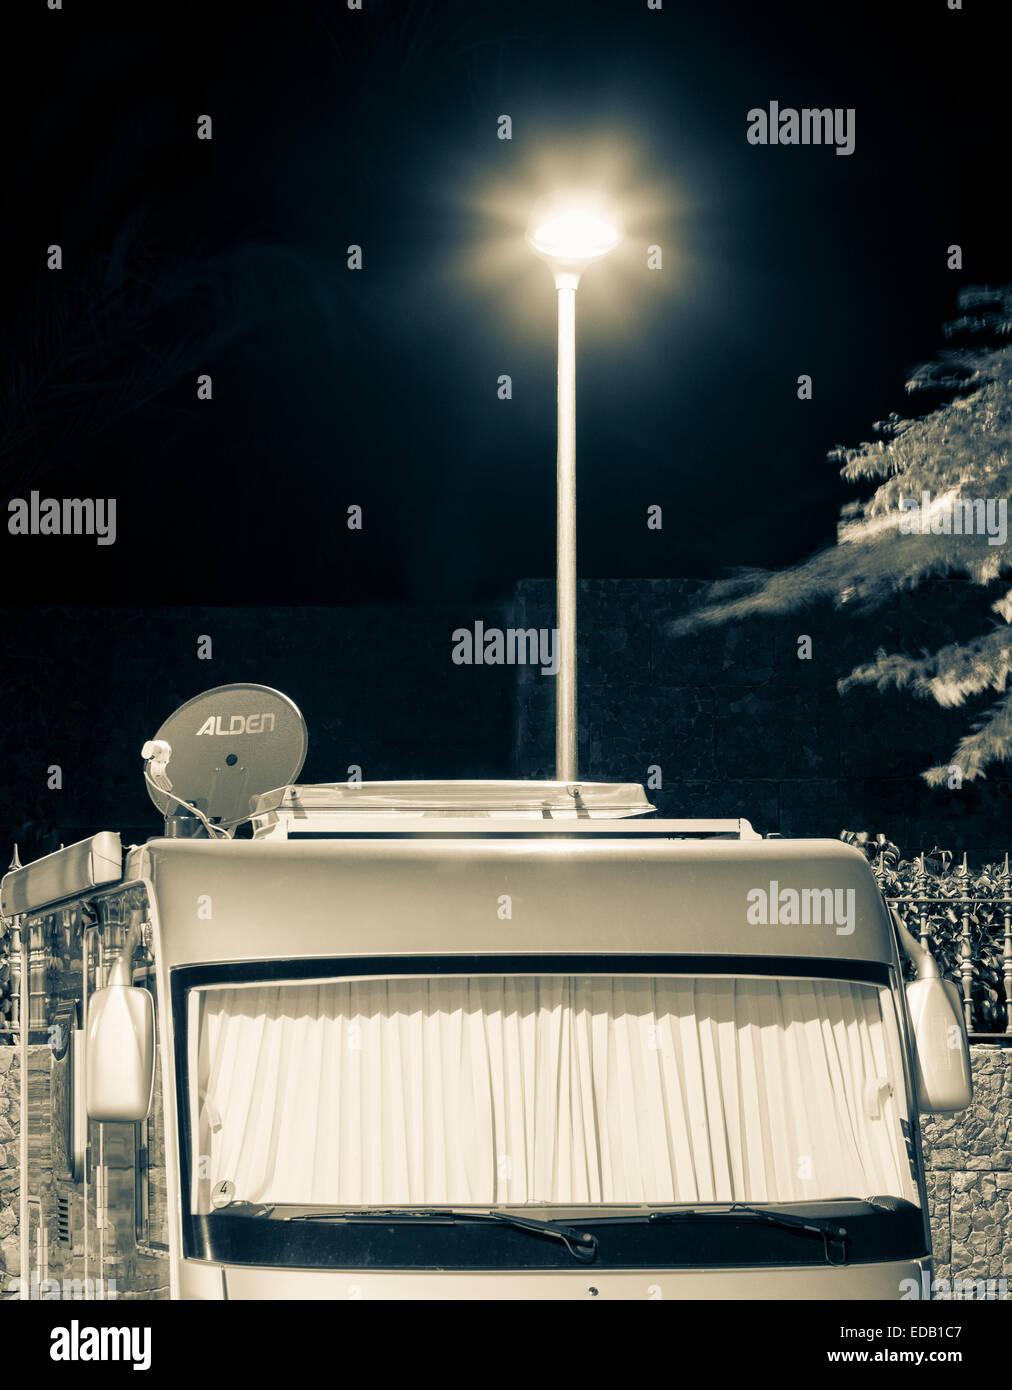 Campervan parked under street light in public car park in Spain - Stock Image